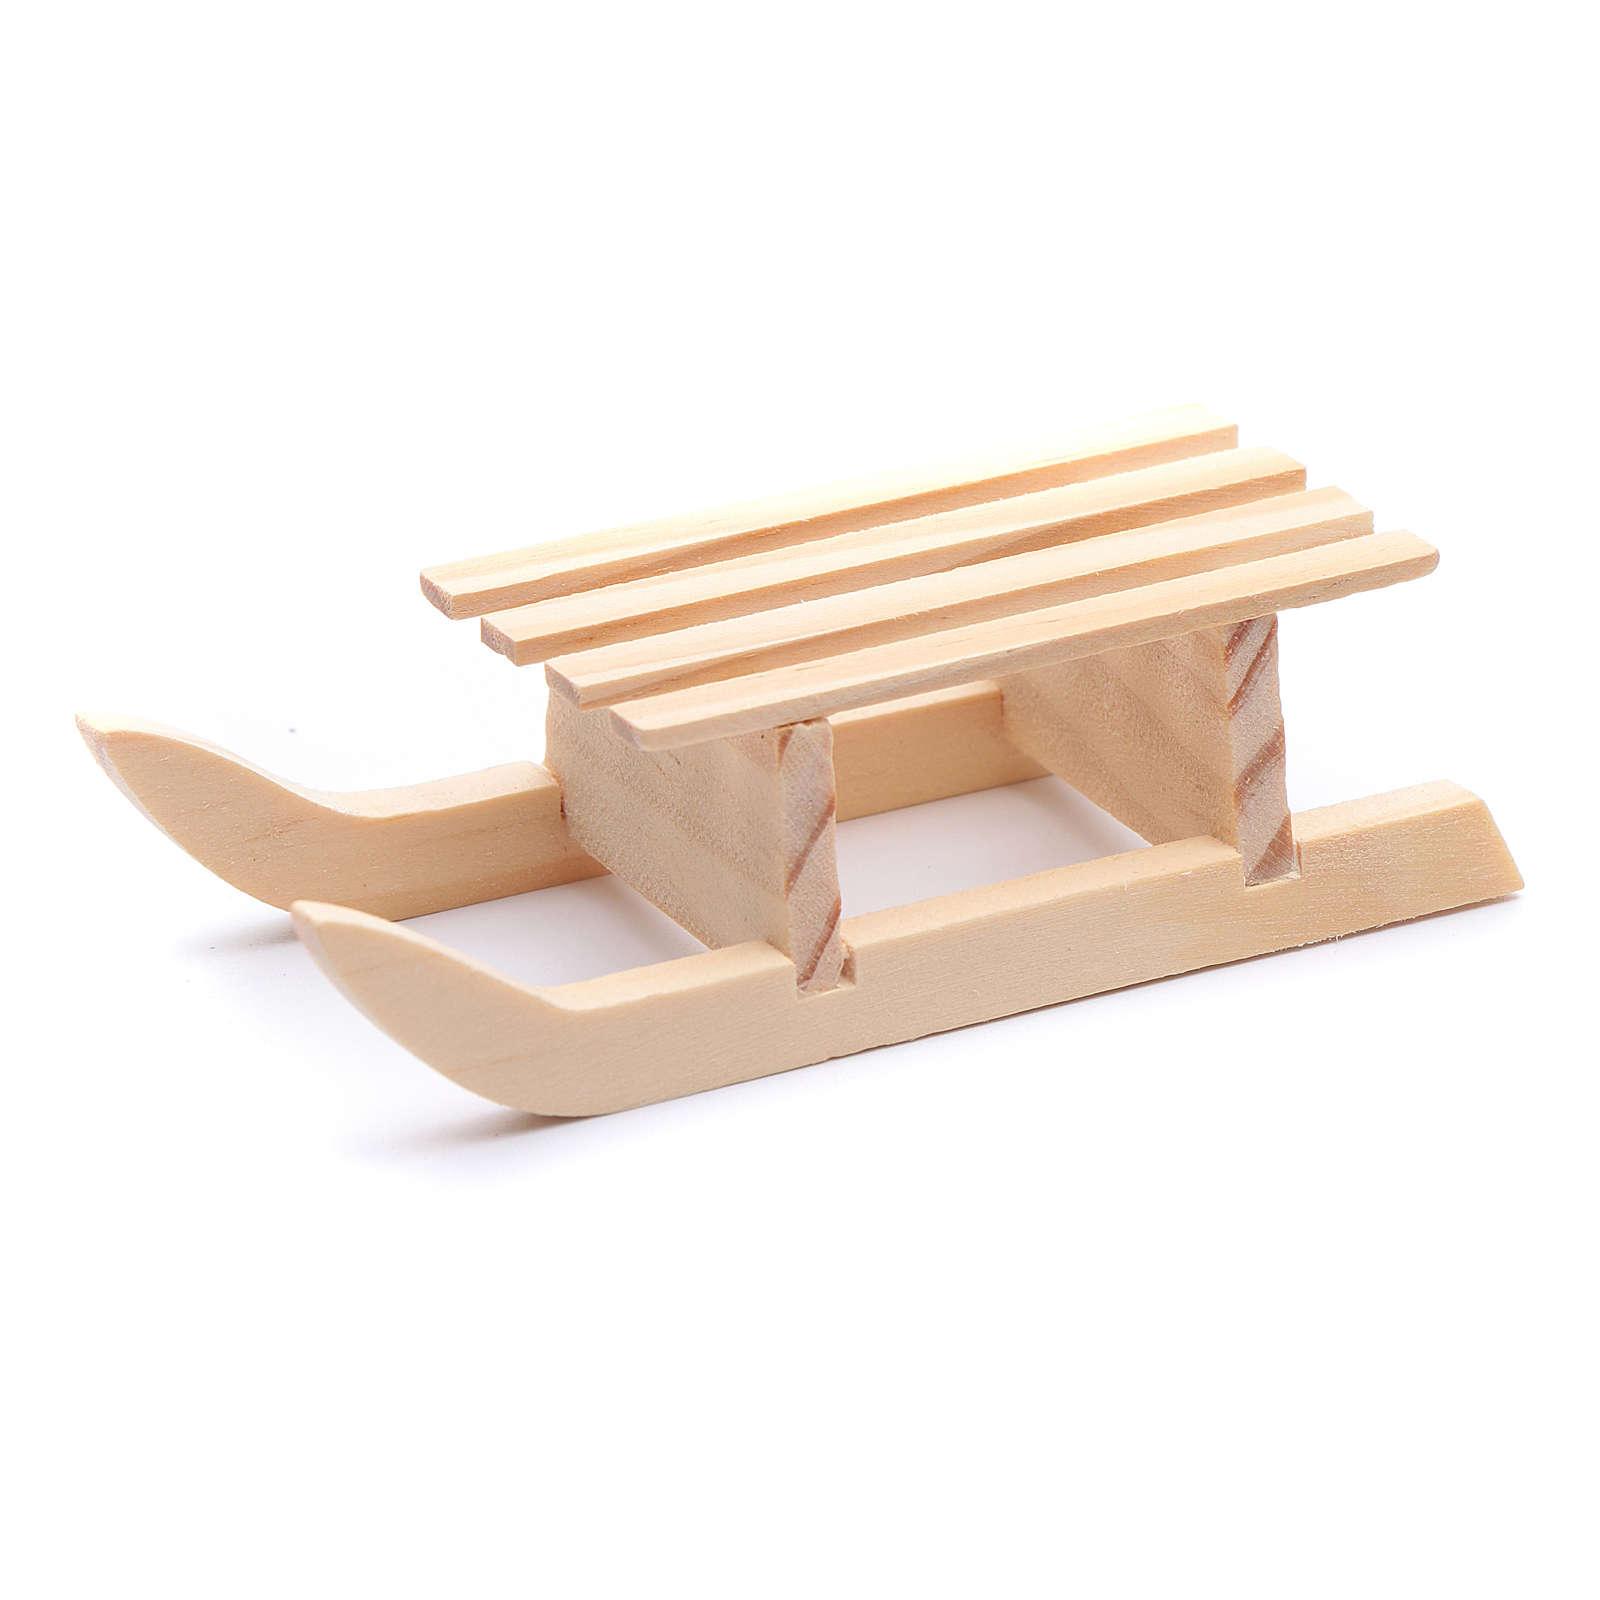 Slitta 3x10x4,5 cm legno per presepe 4